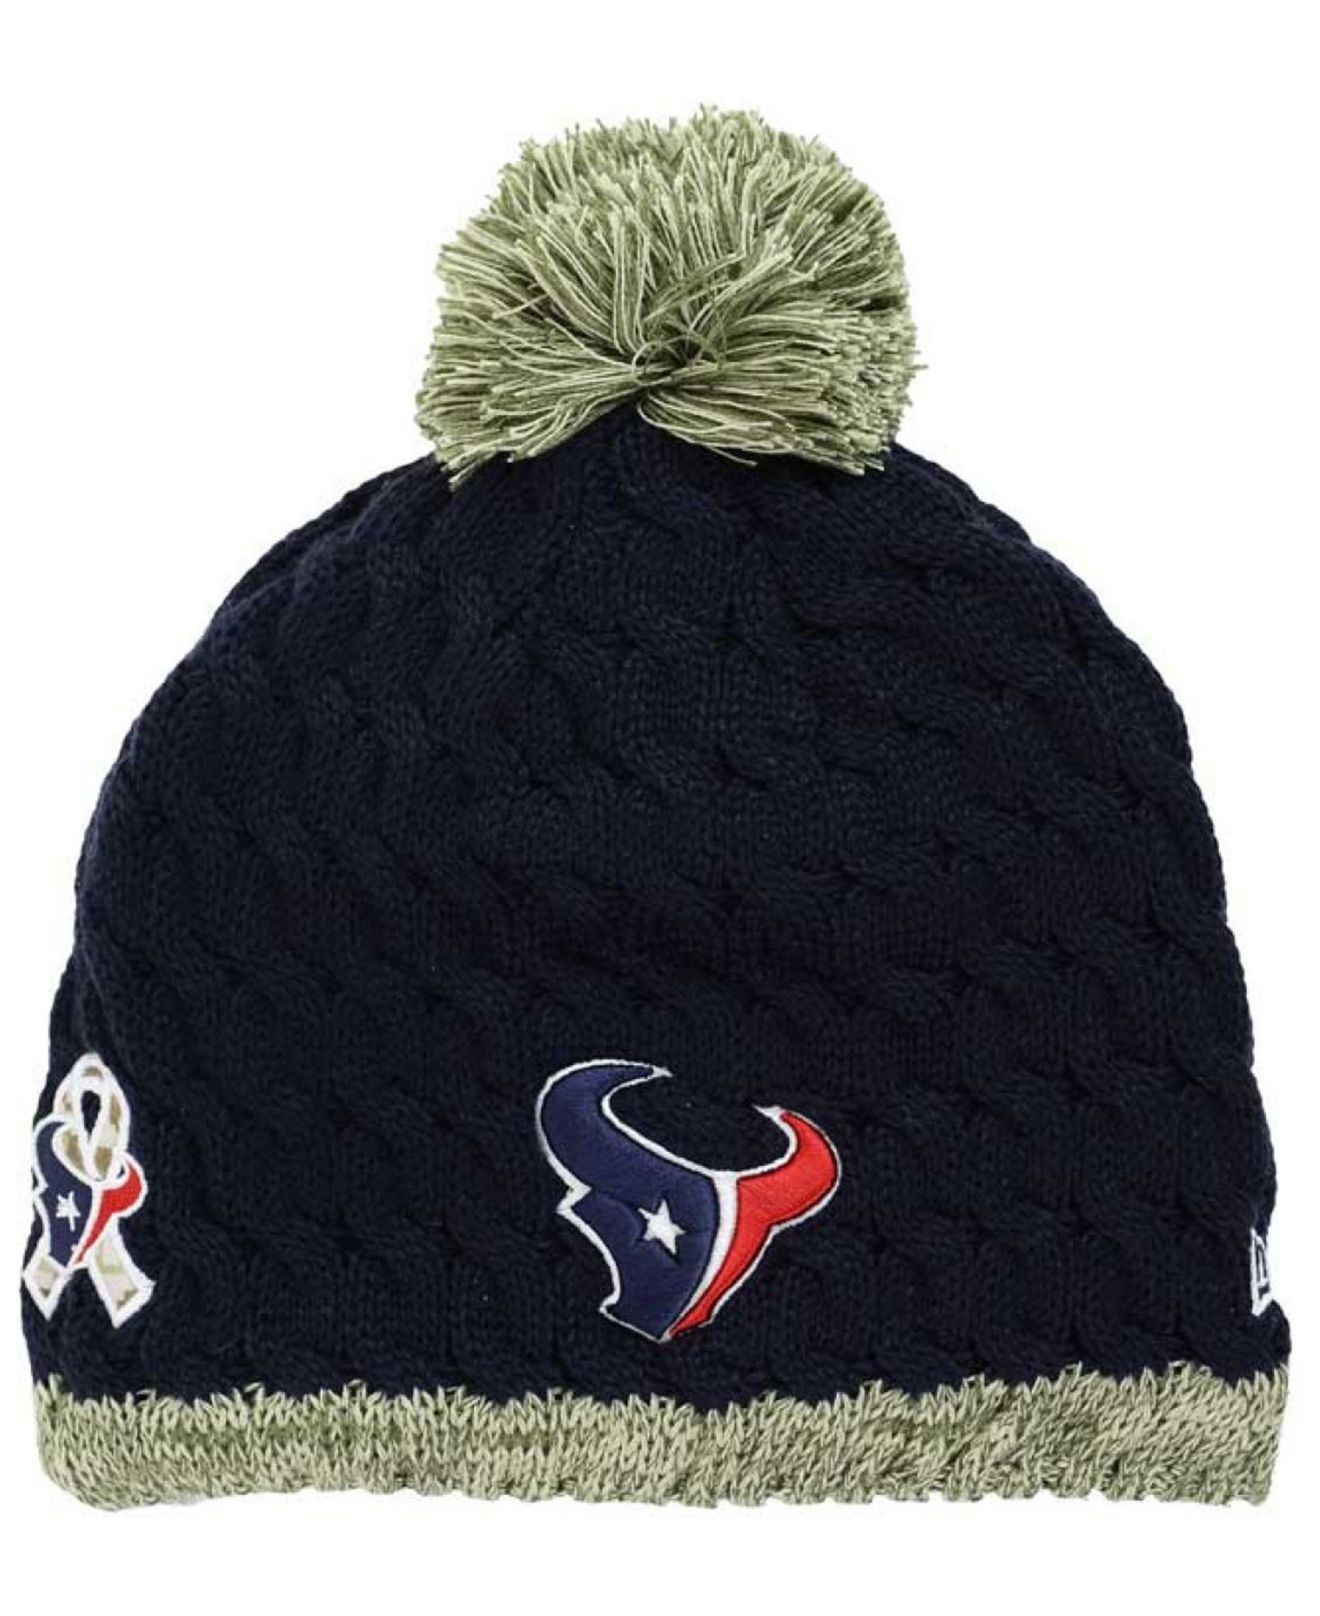 e10b2176d Lyst - KTZ Women s Houston Texans Salute To Service Knit Hat in Blue ...